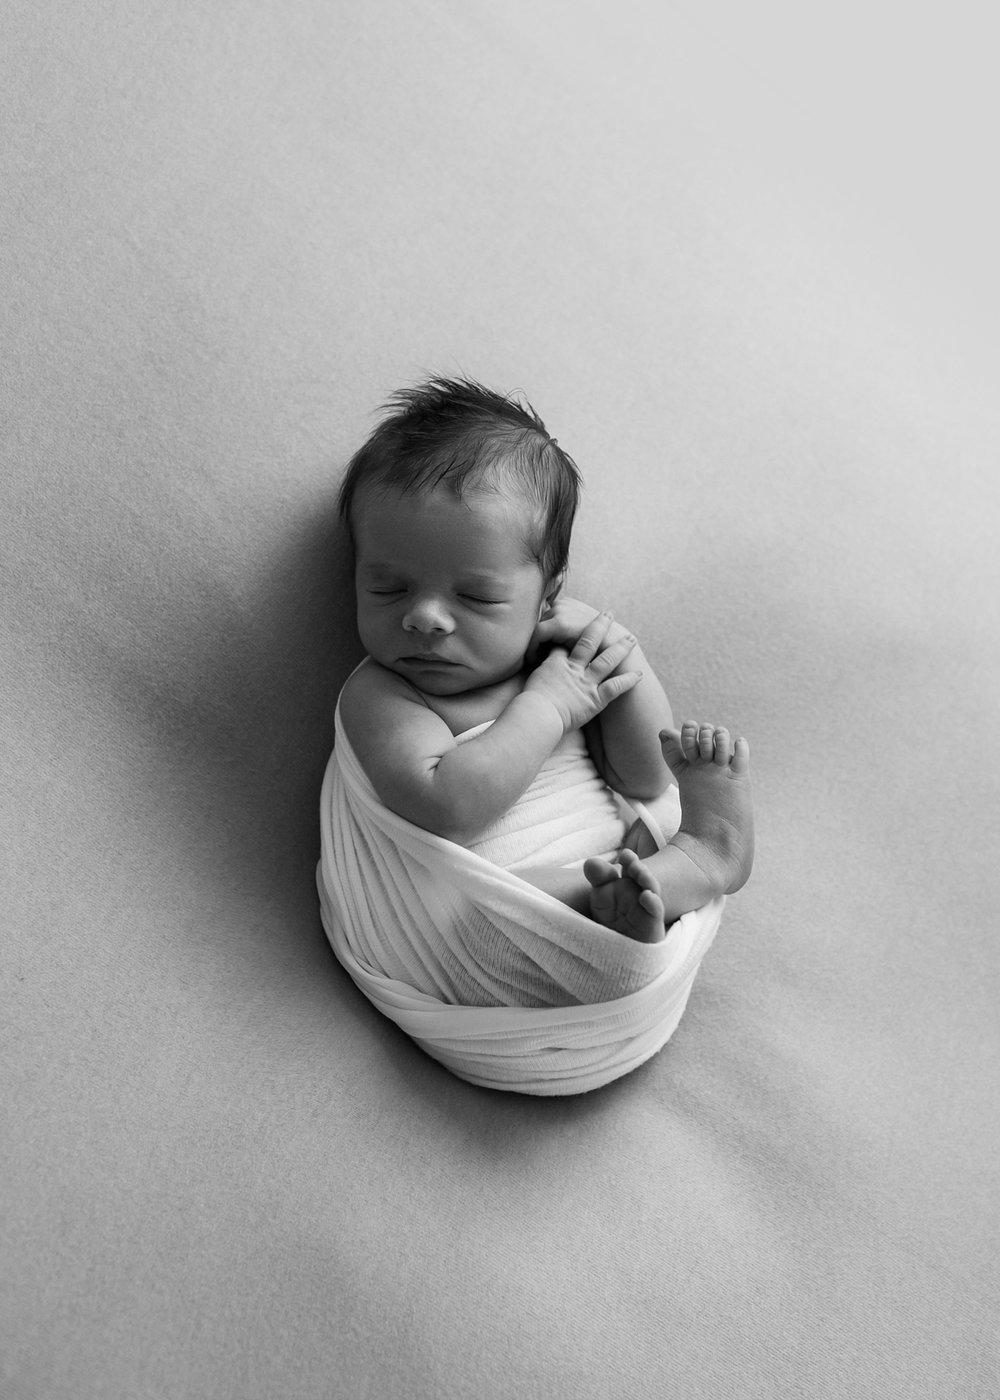 lynchburg-virginia-newborn-pictures-in-the-studio_0014.jpg